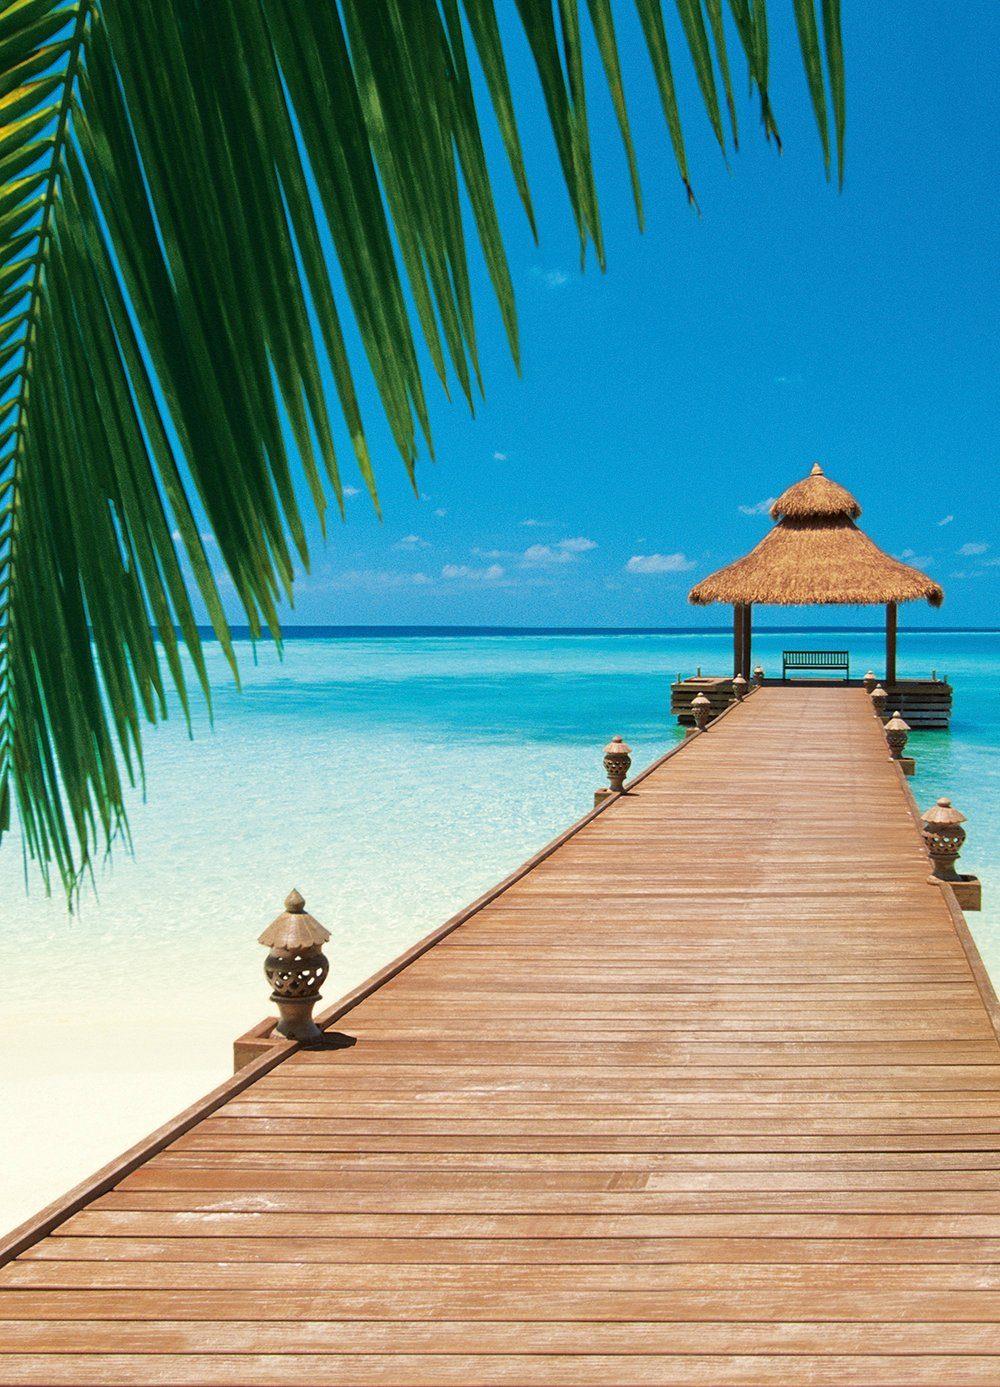 Fototapete »Paradise Beach«, 4-teilig, 183x254 cm